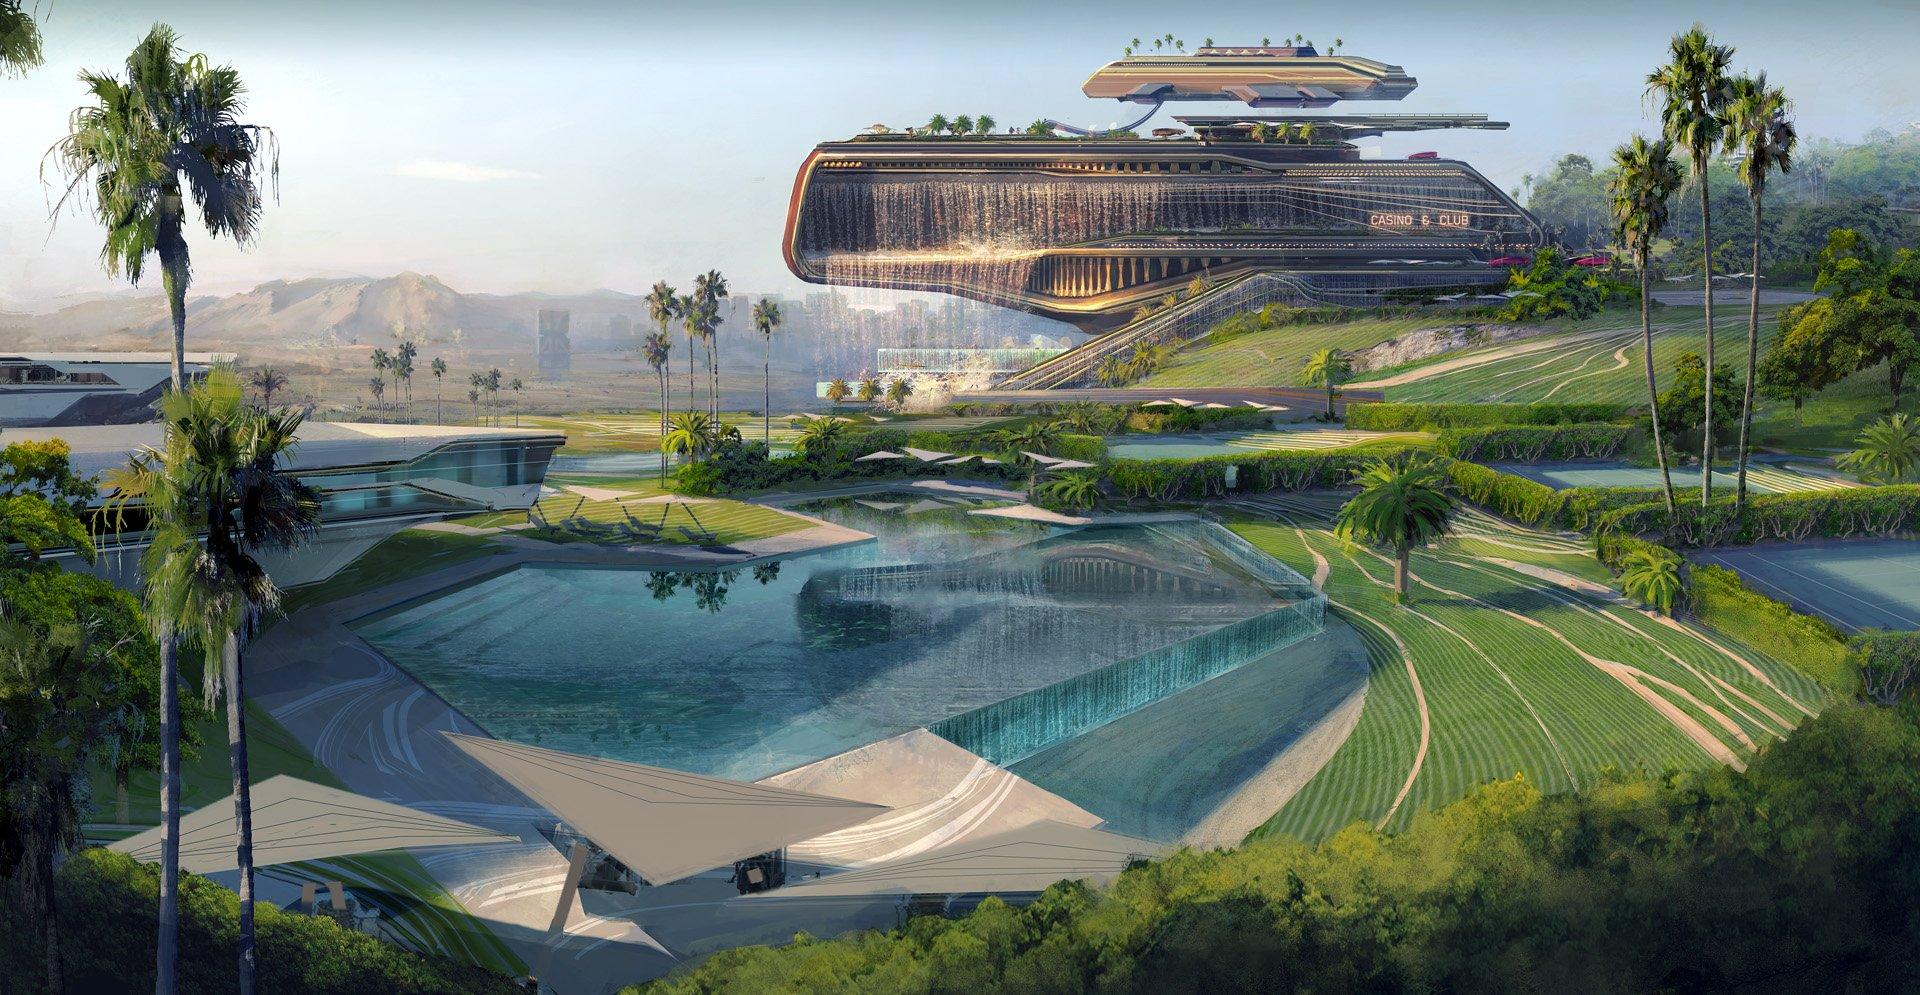 Konceptbilder från Cyberpunk 2077 visar överdådiga Westbrook